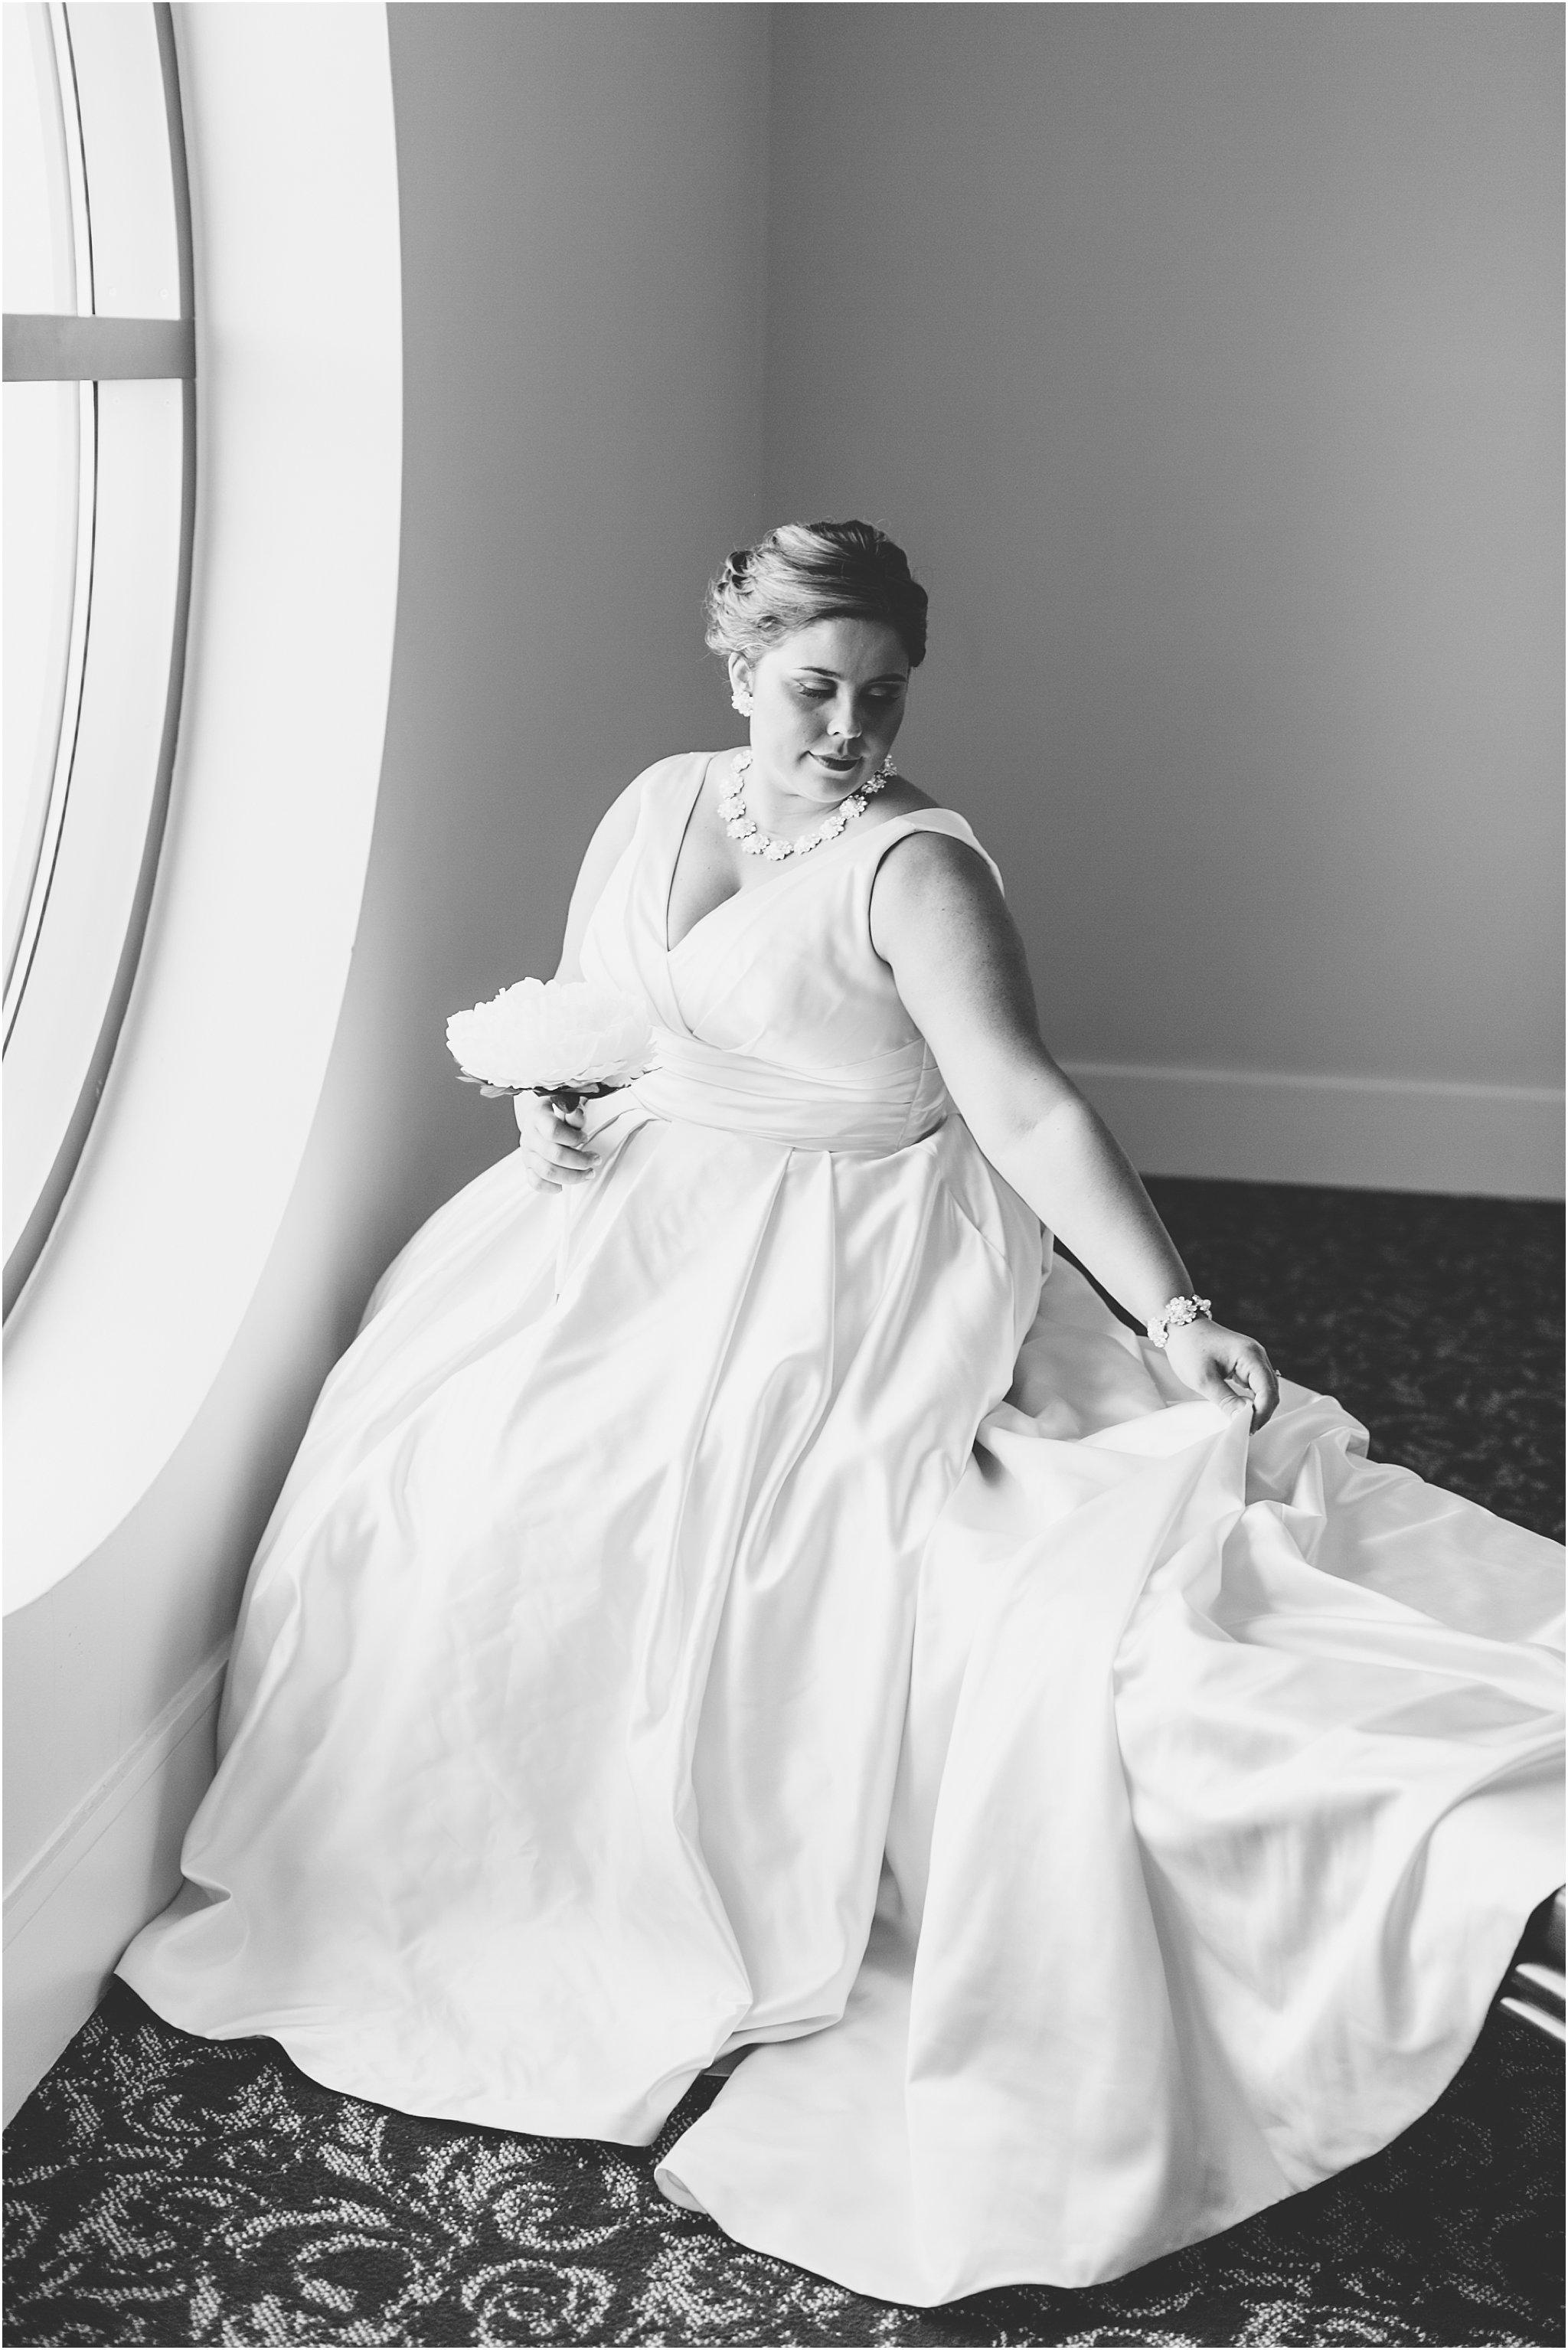 va_jessica_ryan_photography_virginia_wedding_norfolk_harrison_opera_house_norfolk_arts_district_portraits_3778